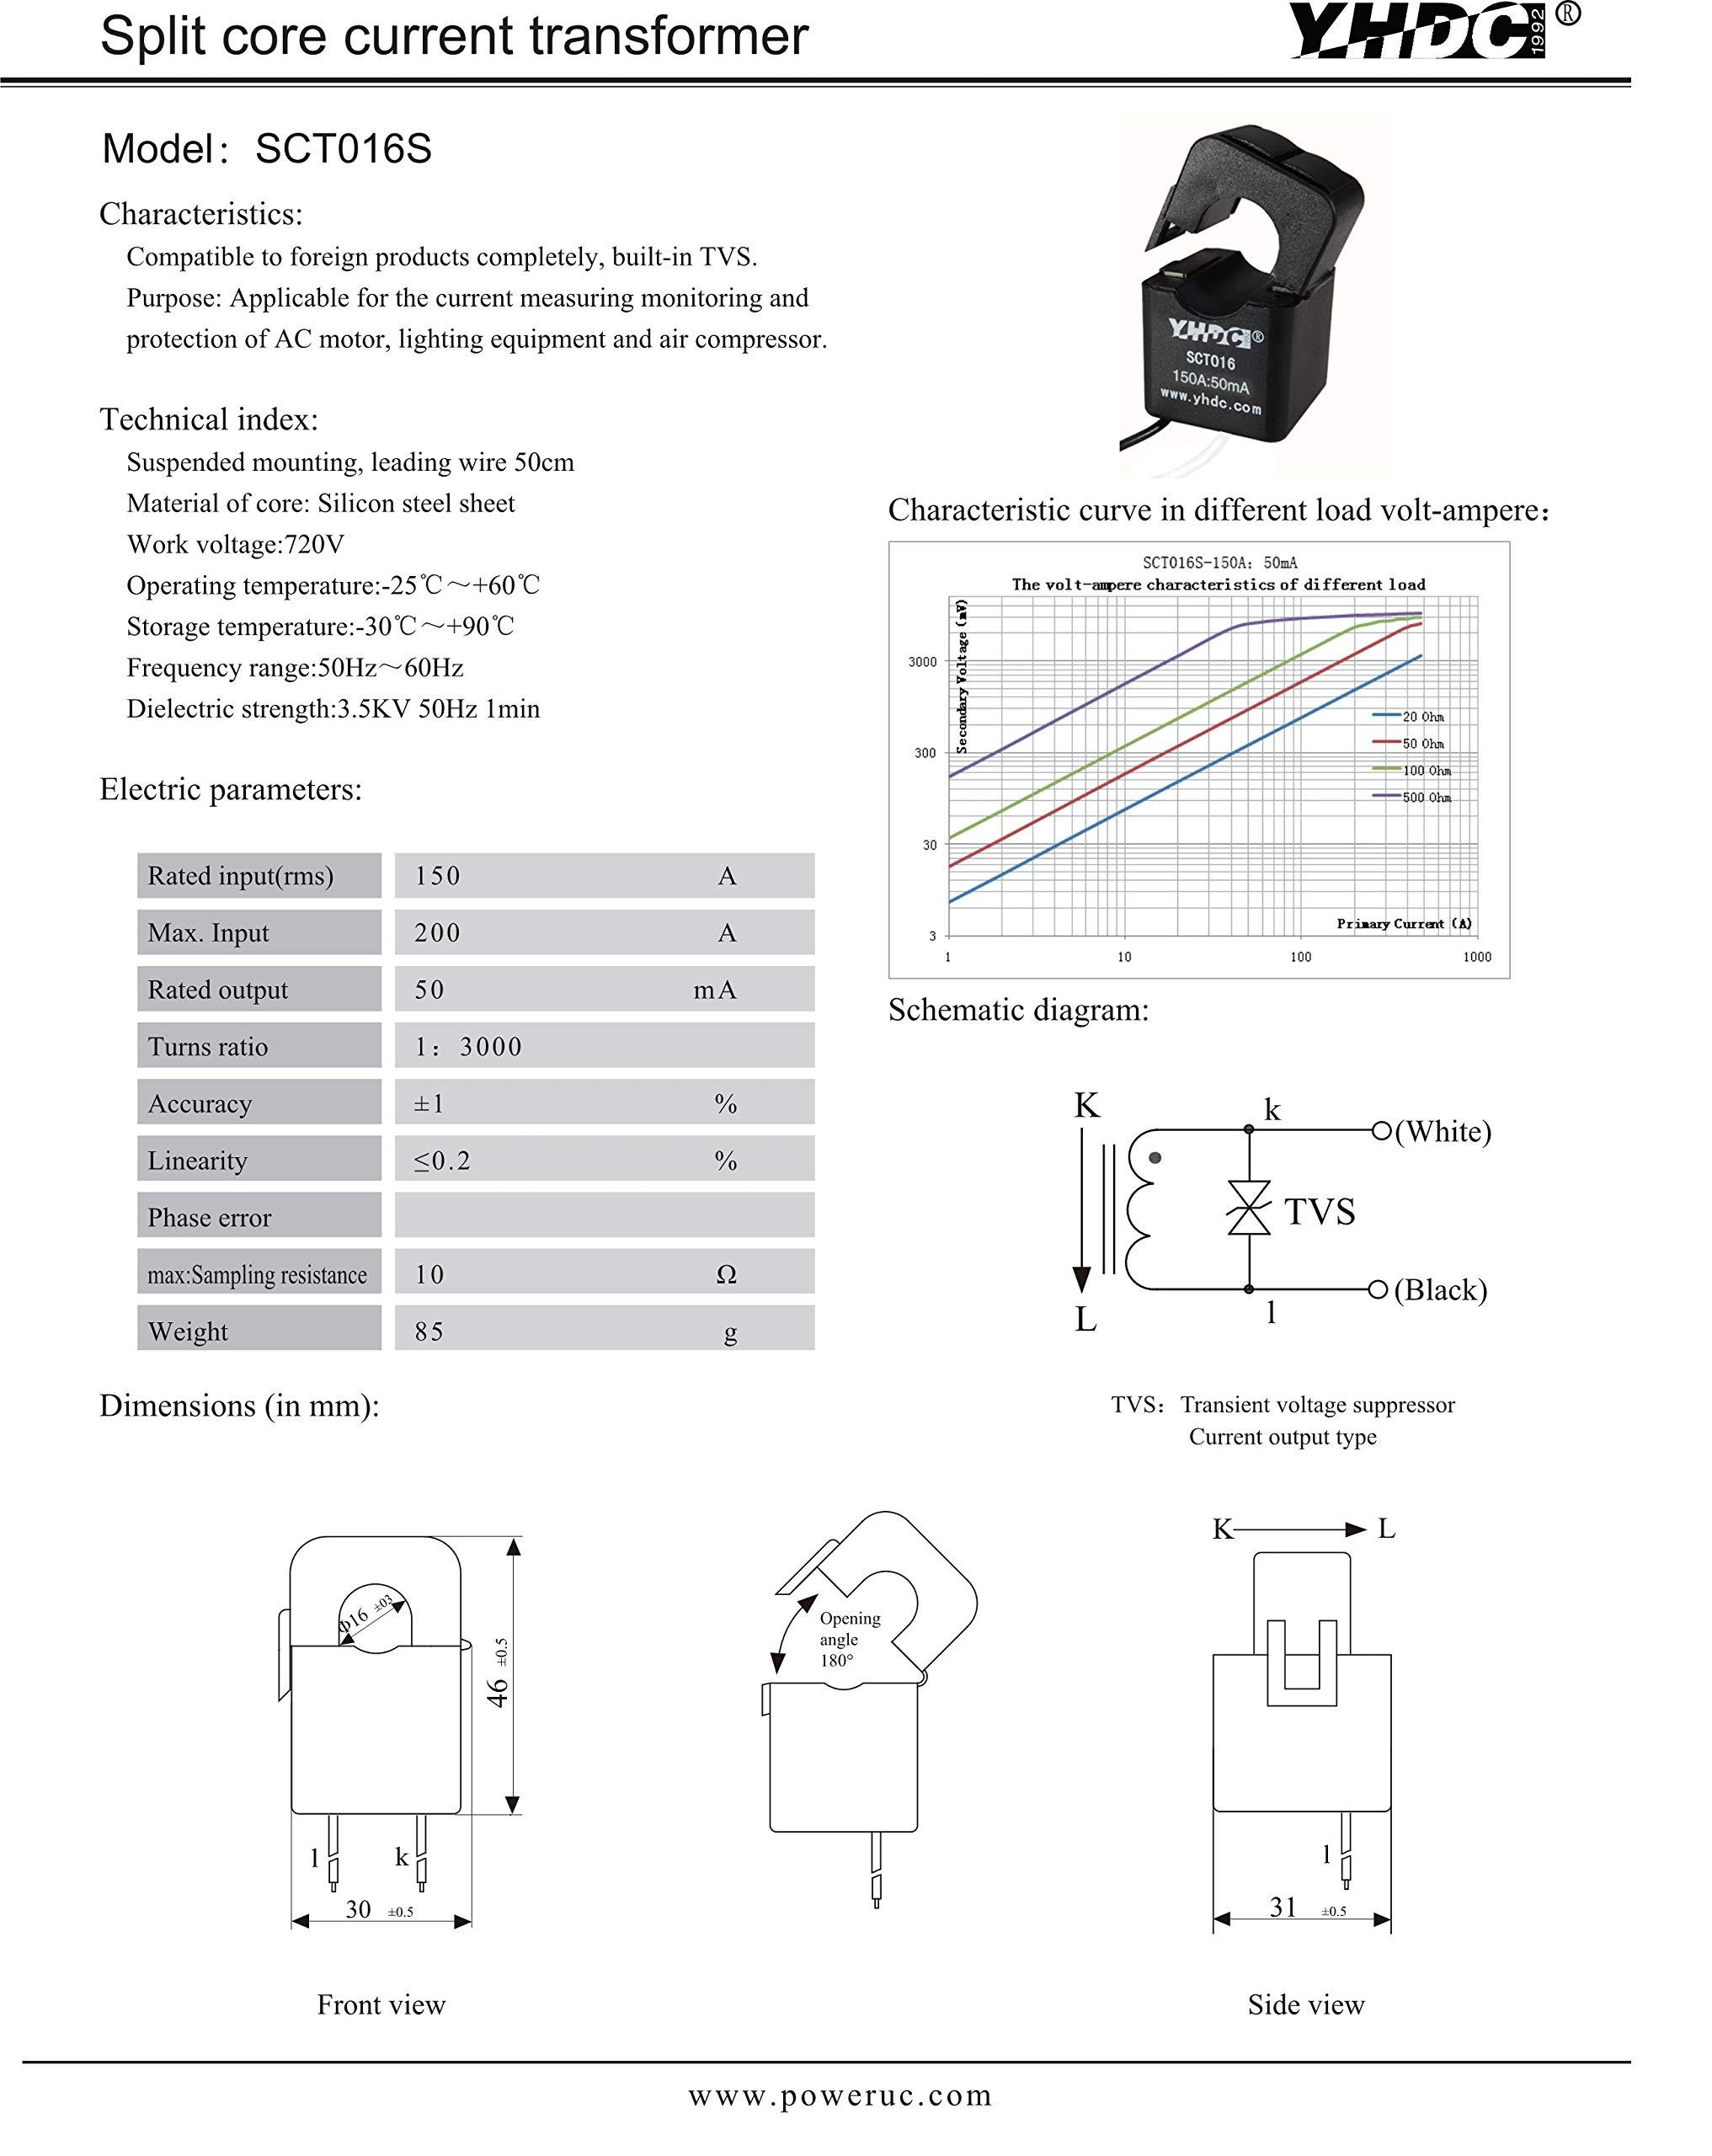 YHDC Split core Current Transformer SCT13050QT 2000A//5A